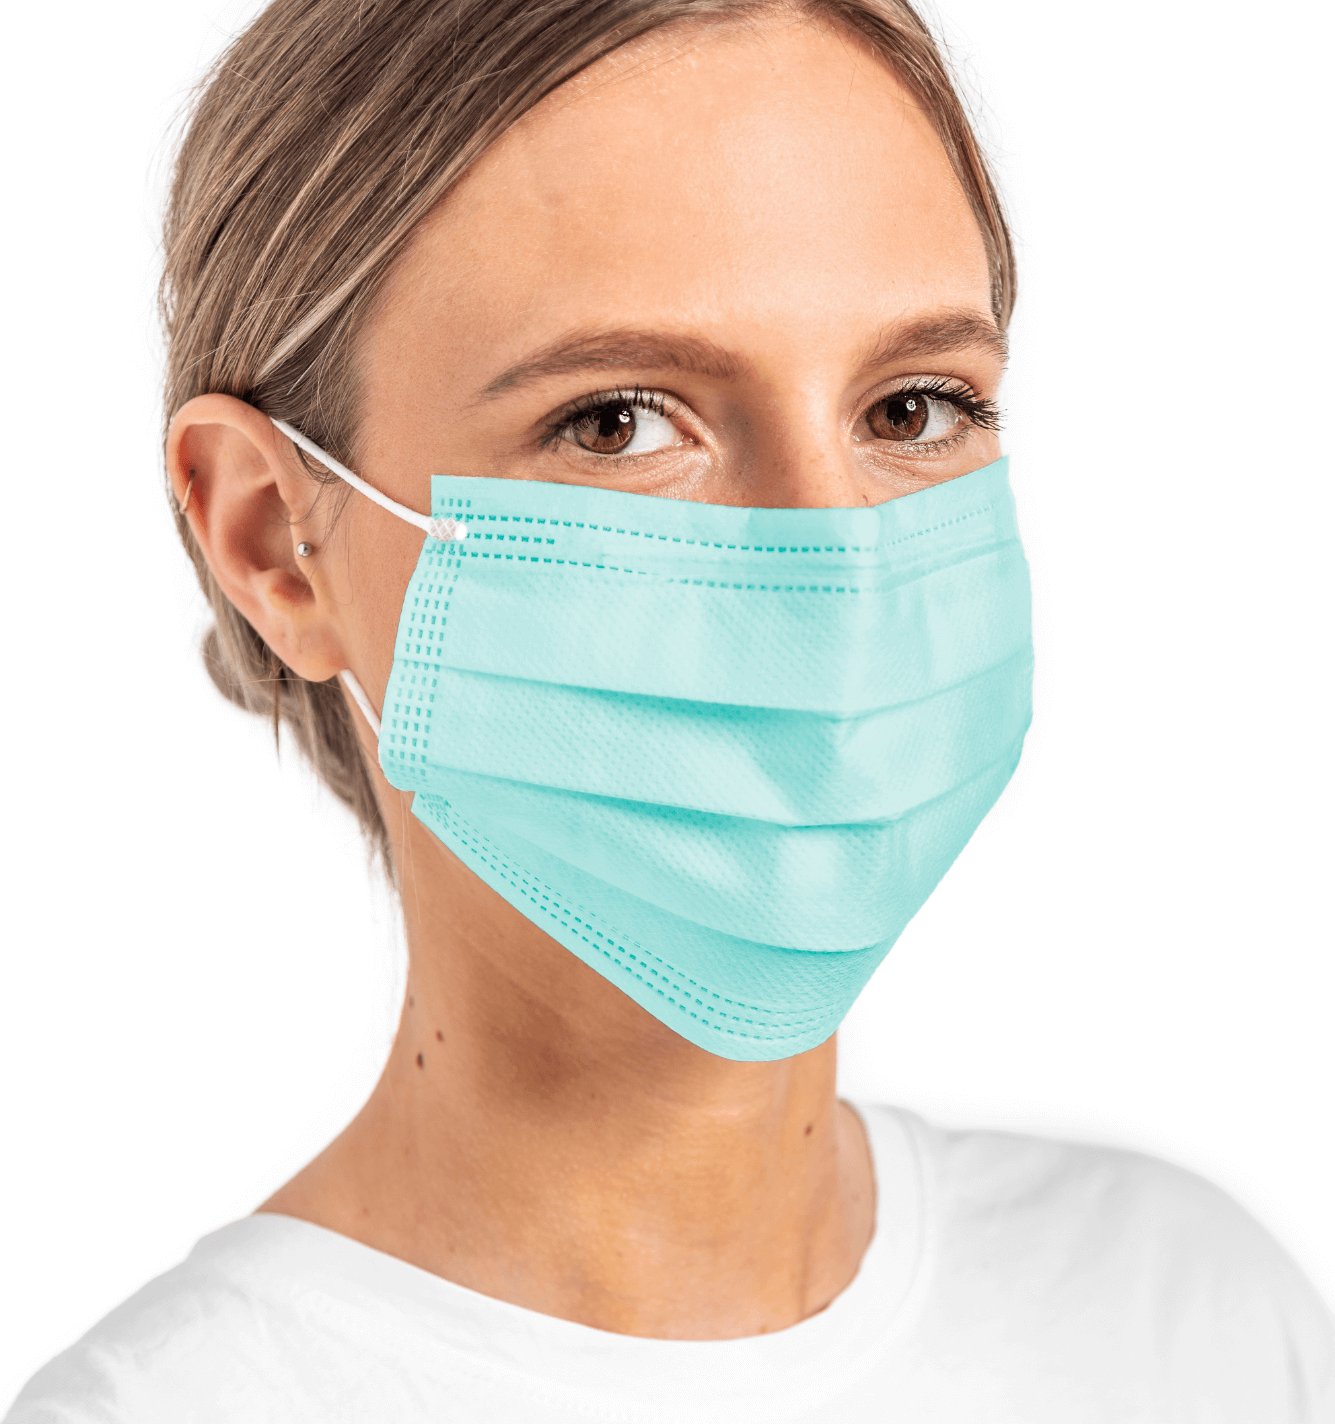 Medizinische-Maske-OP-Maske-Typ-IIR-Mundschutz-Gruen-Winter-Group-opMgruen-0098